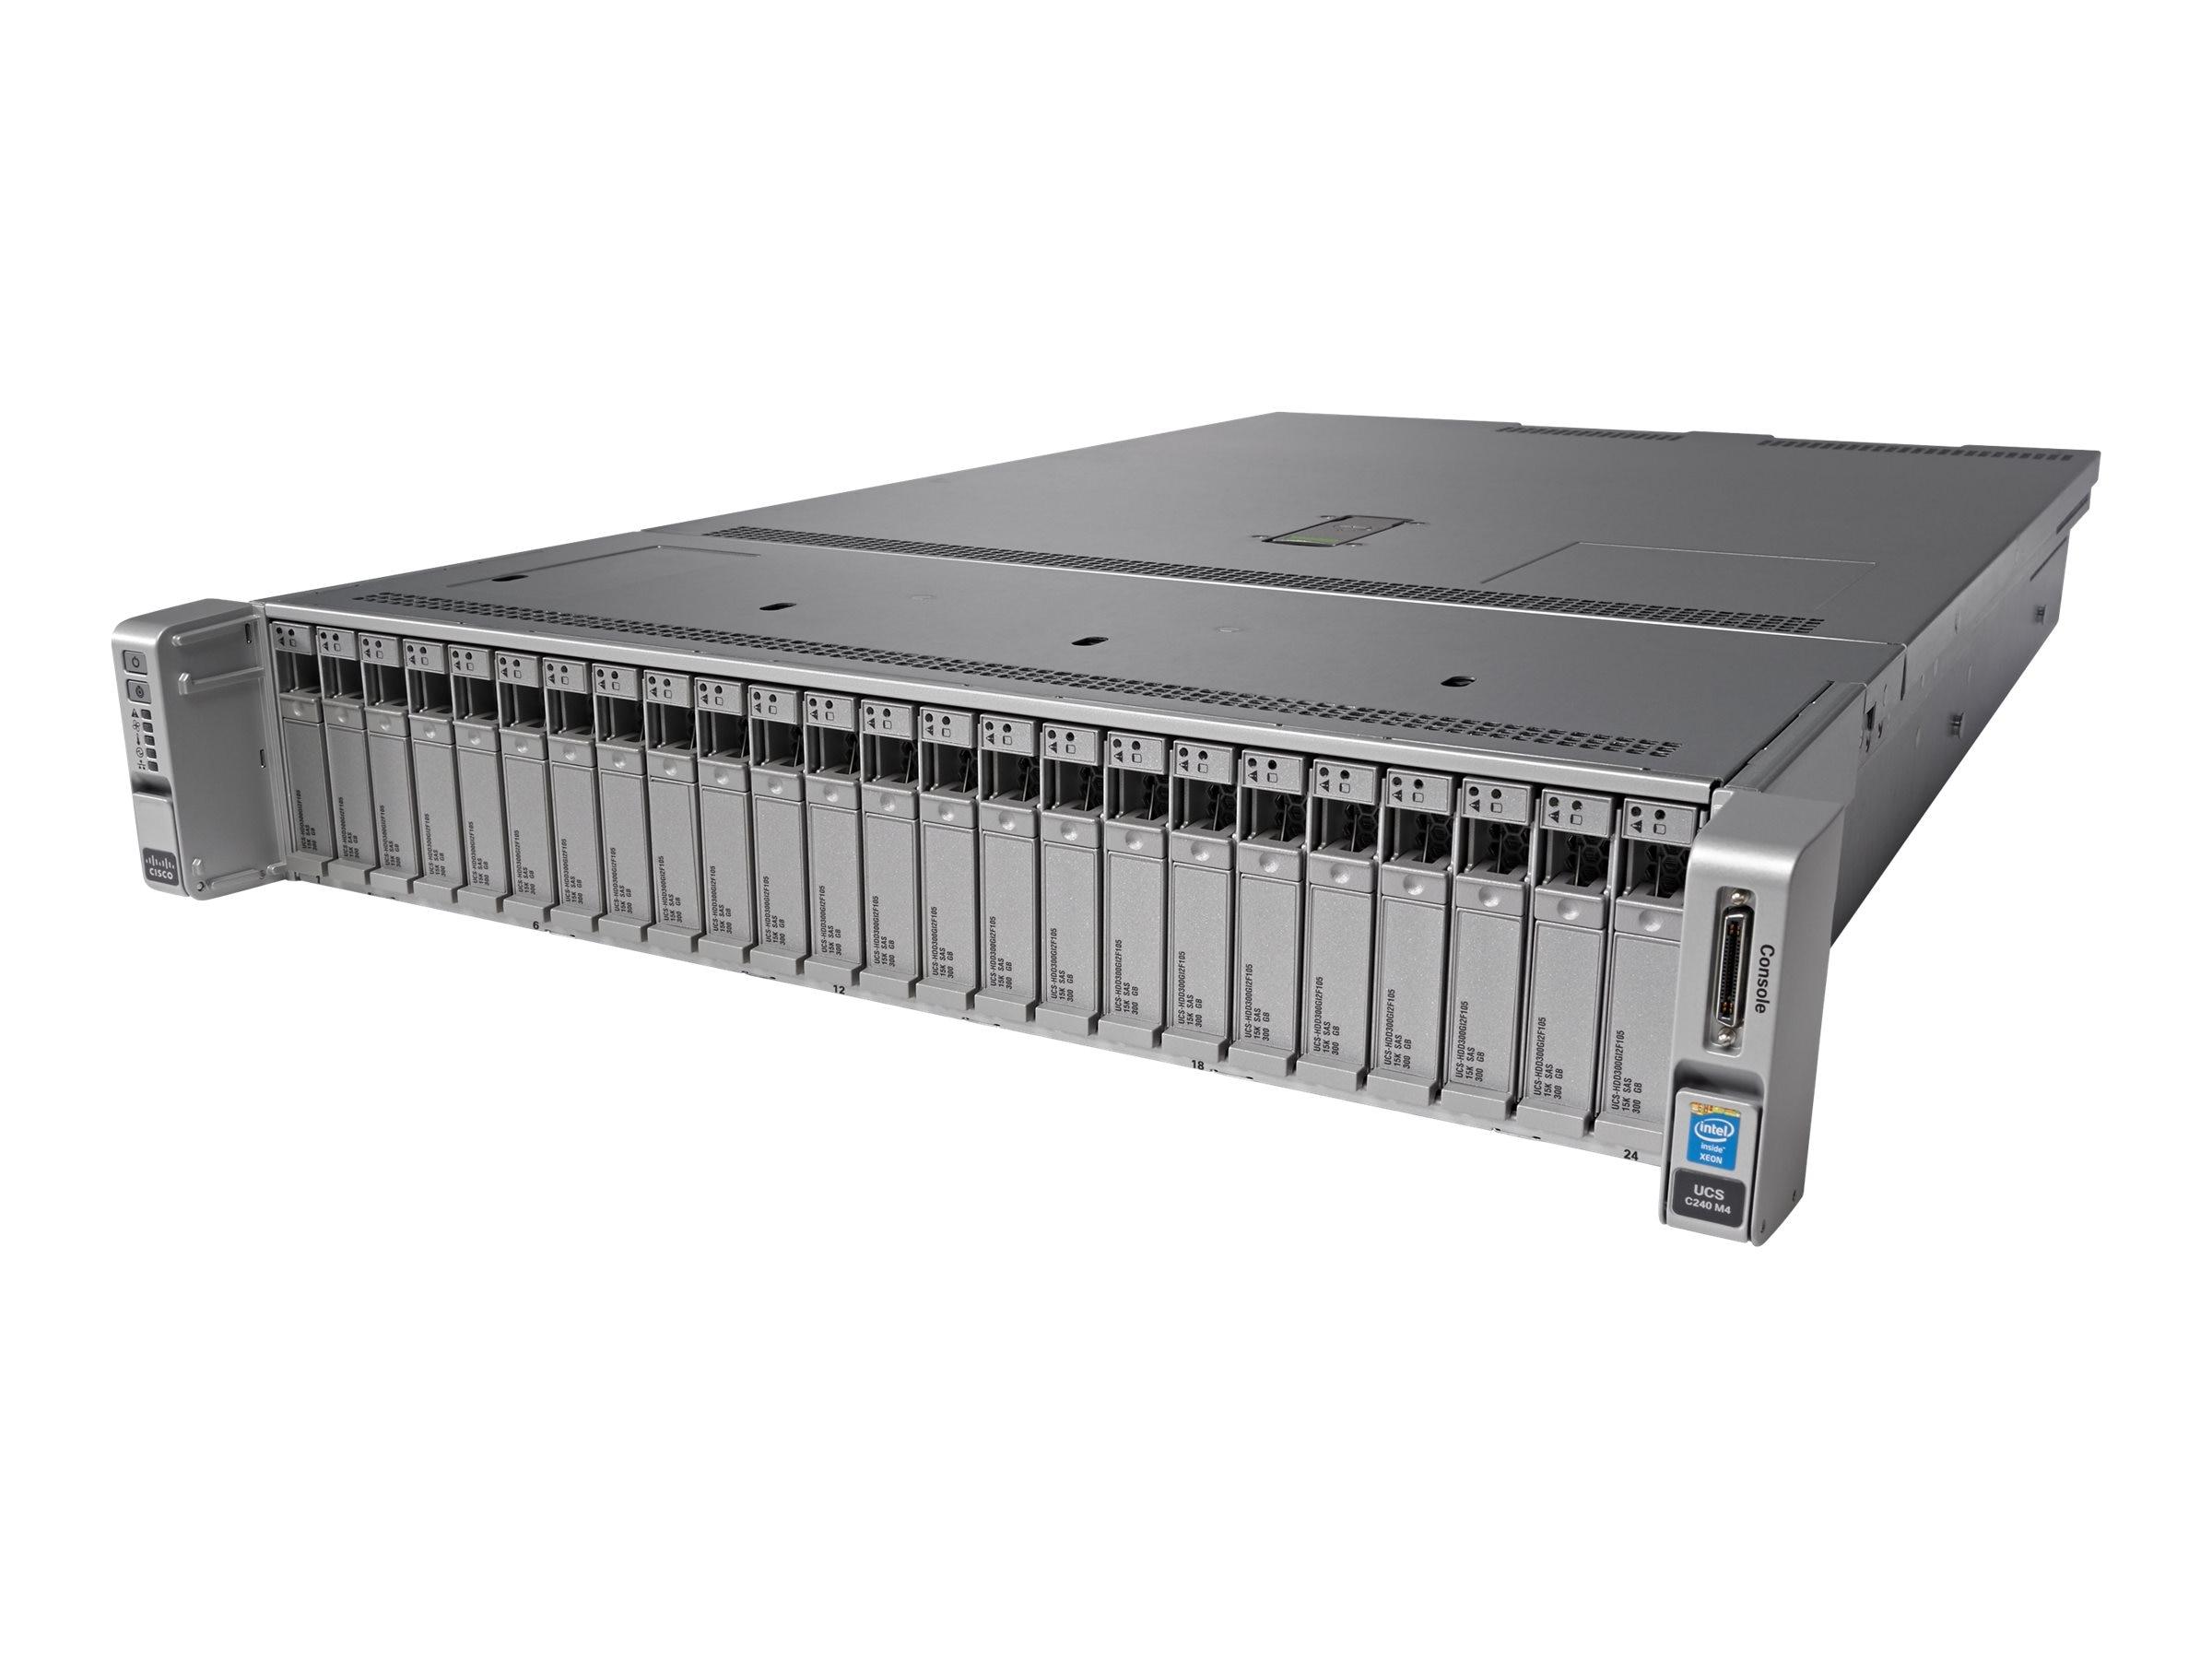 Ucs Wiring Diagram Library Cisco Switch Smartplay C240 Intel 21ghz Xeon Sp C240m4 B S2